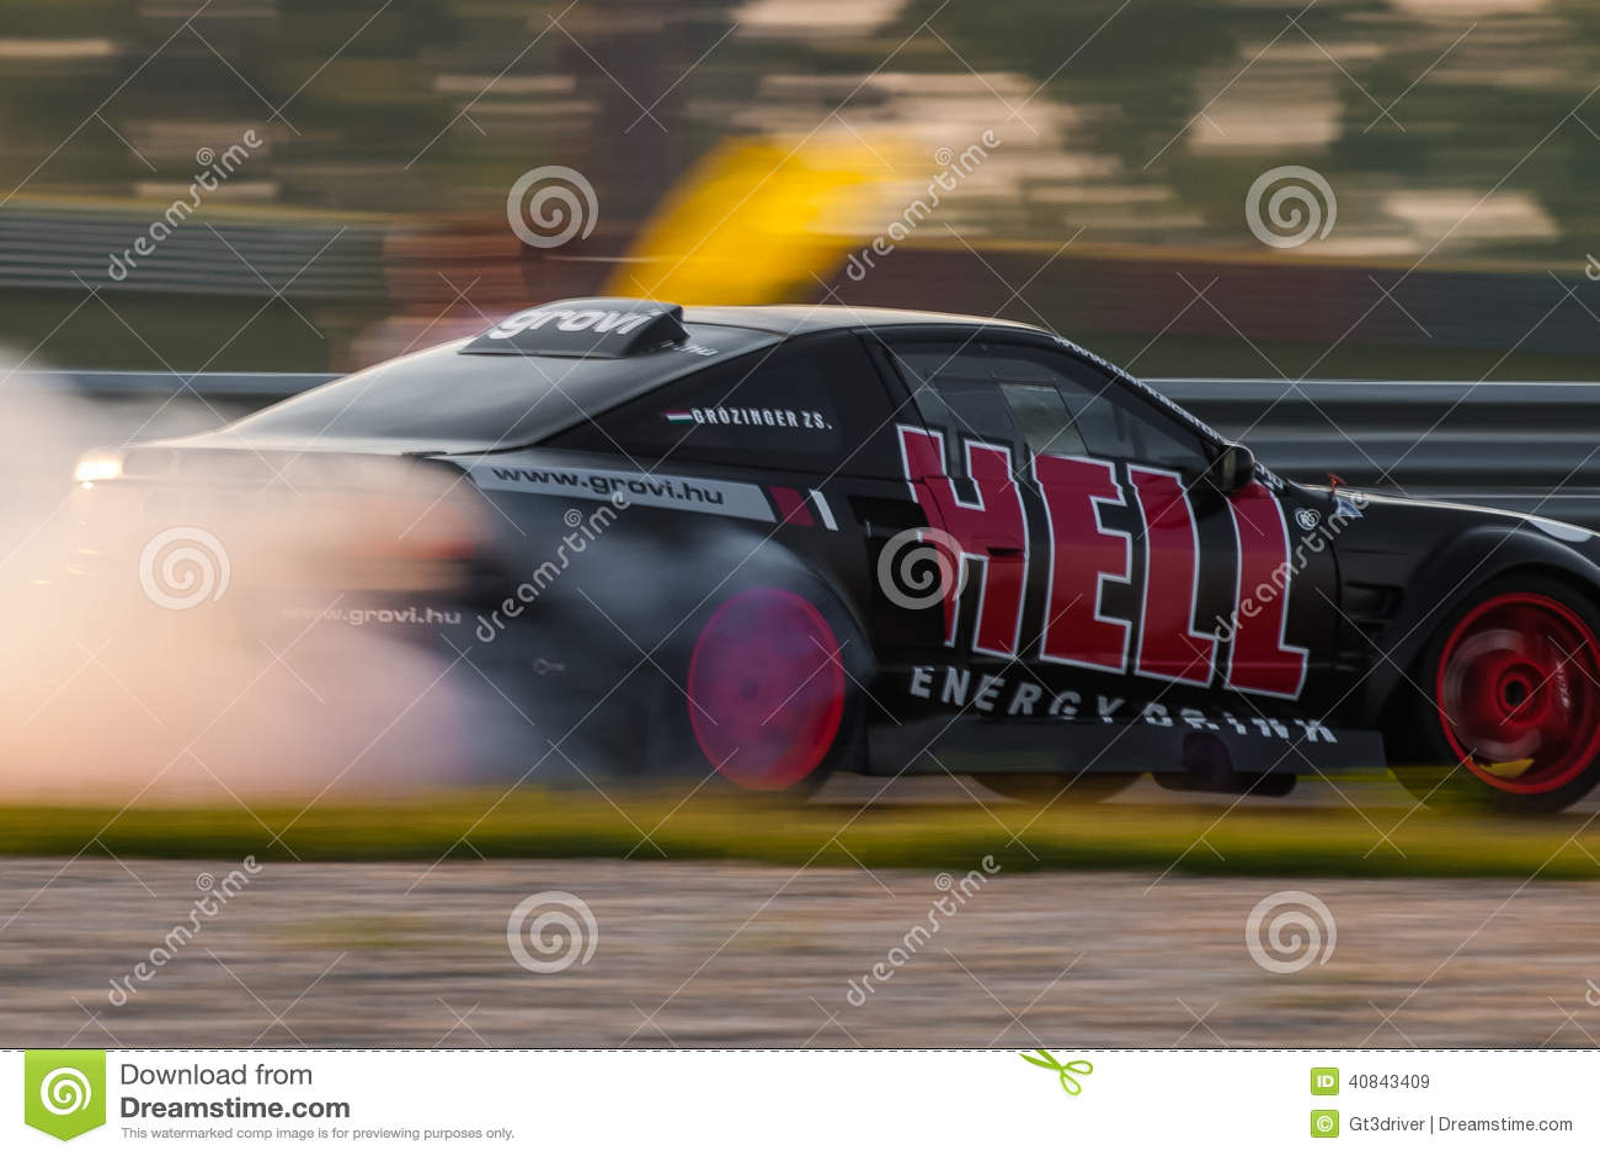 Nissan Silvia drift car